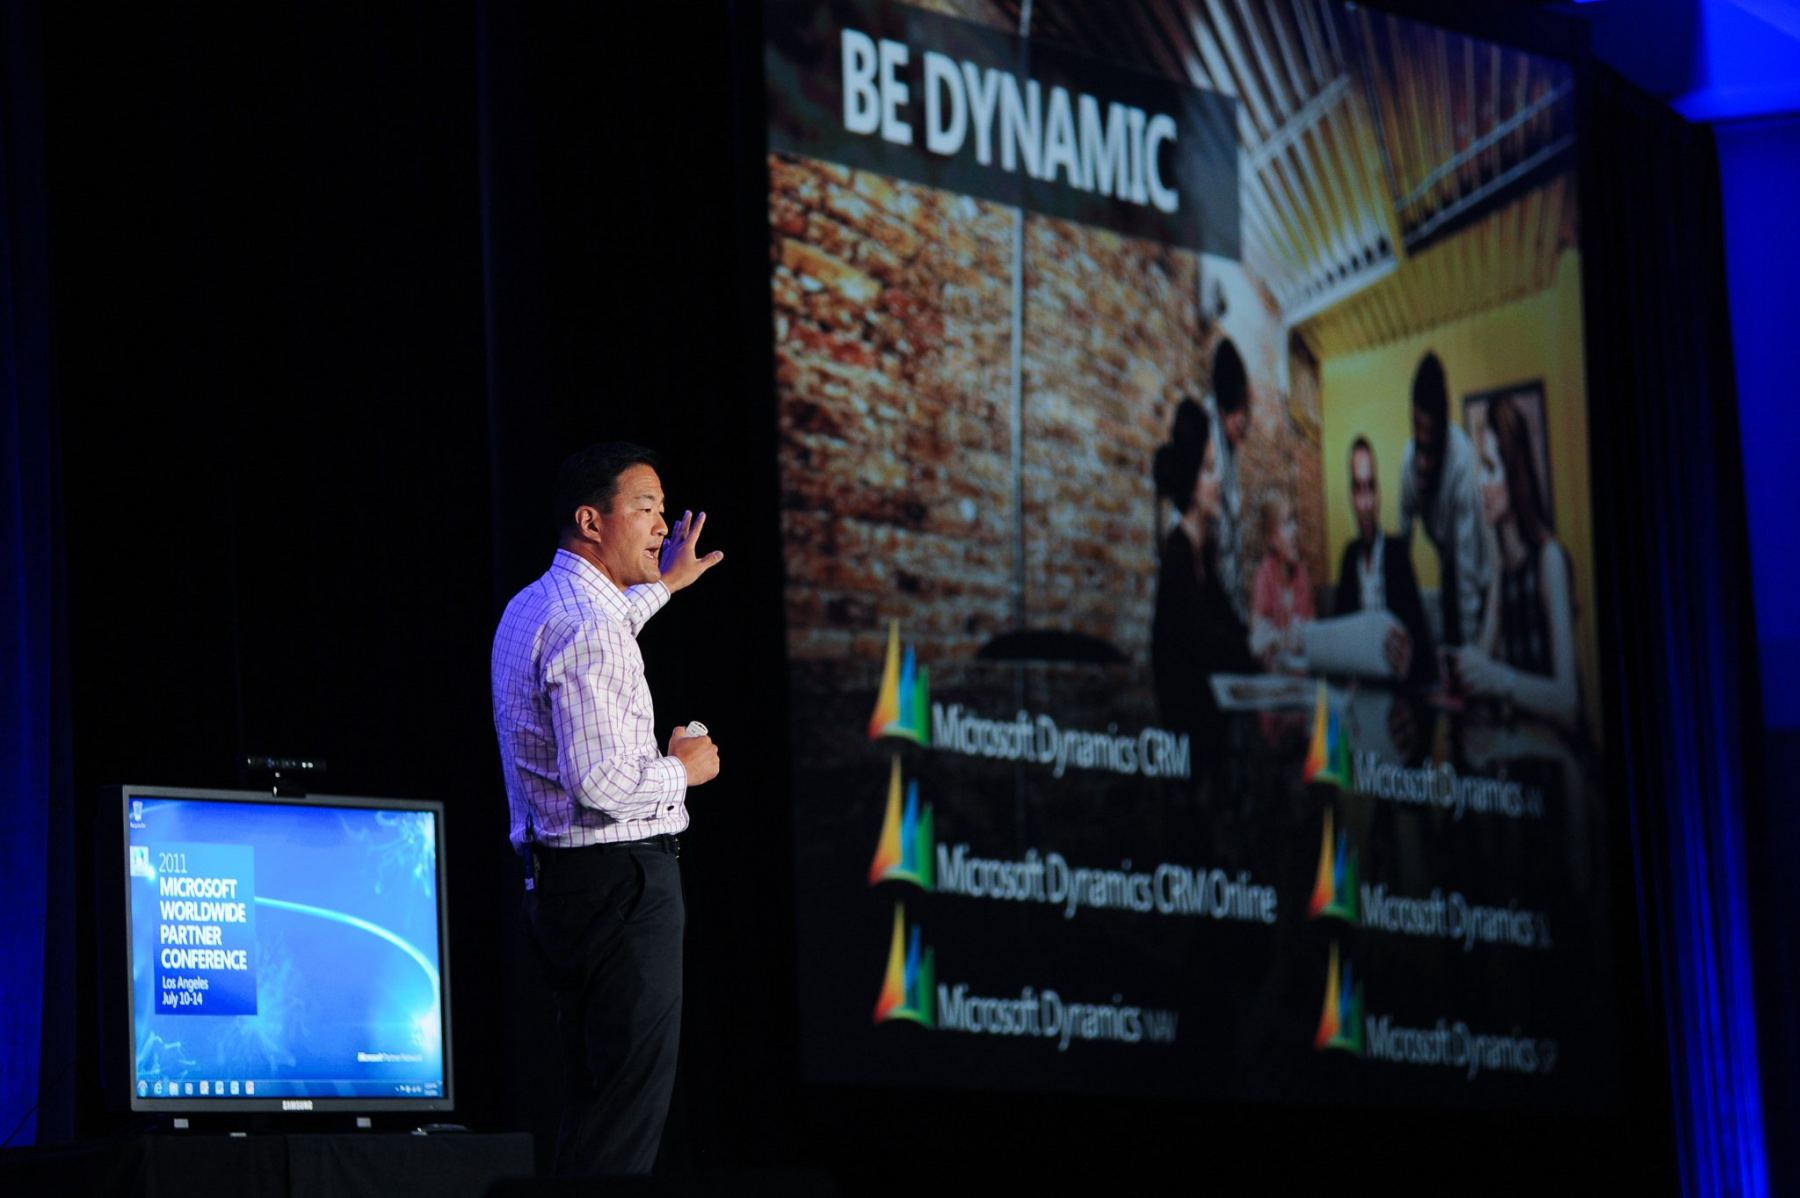 Microsoft VP Michael Park presents